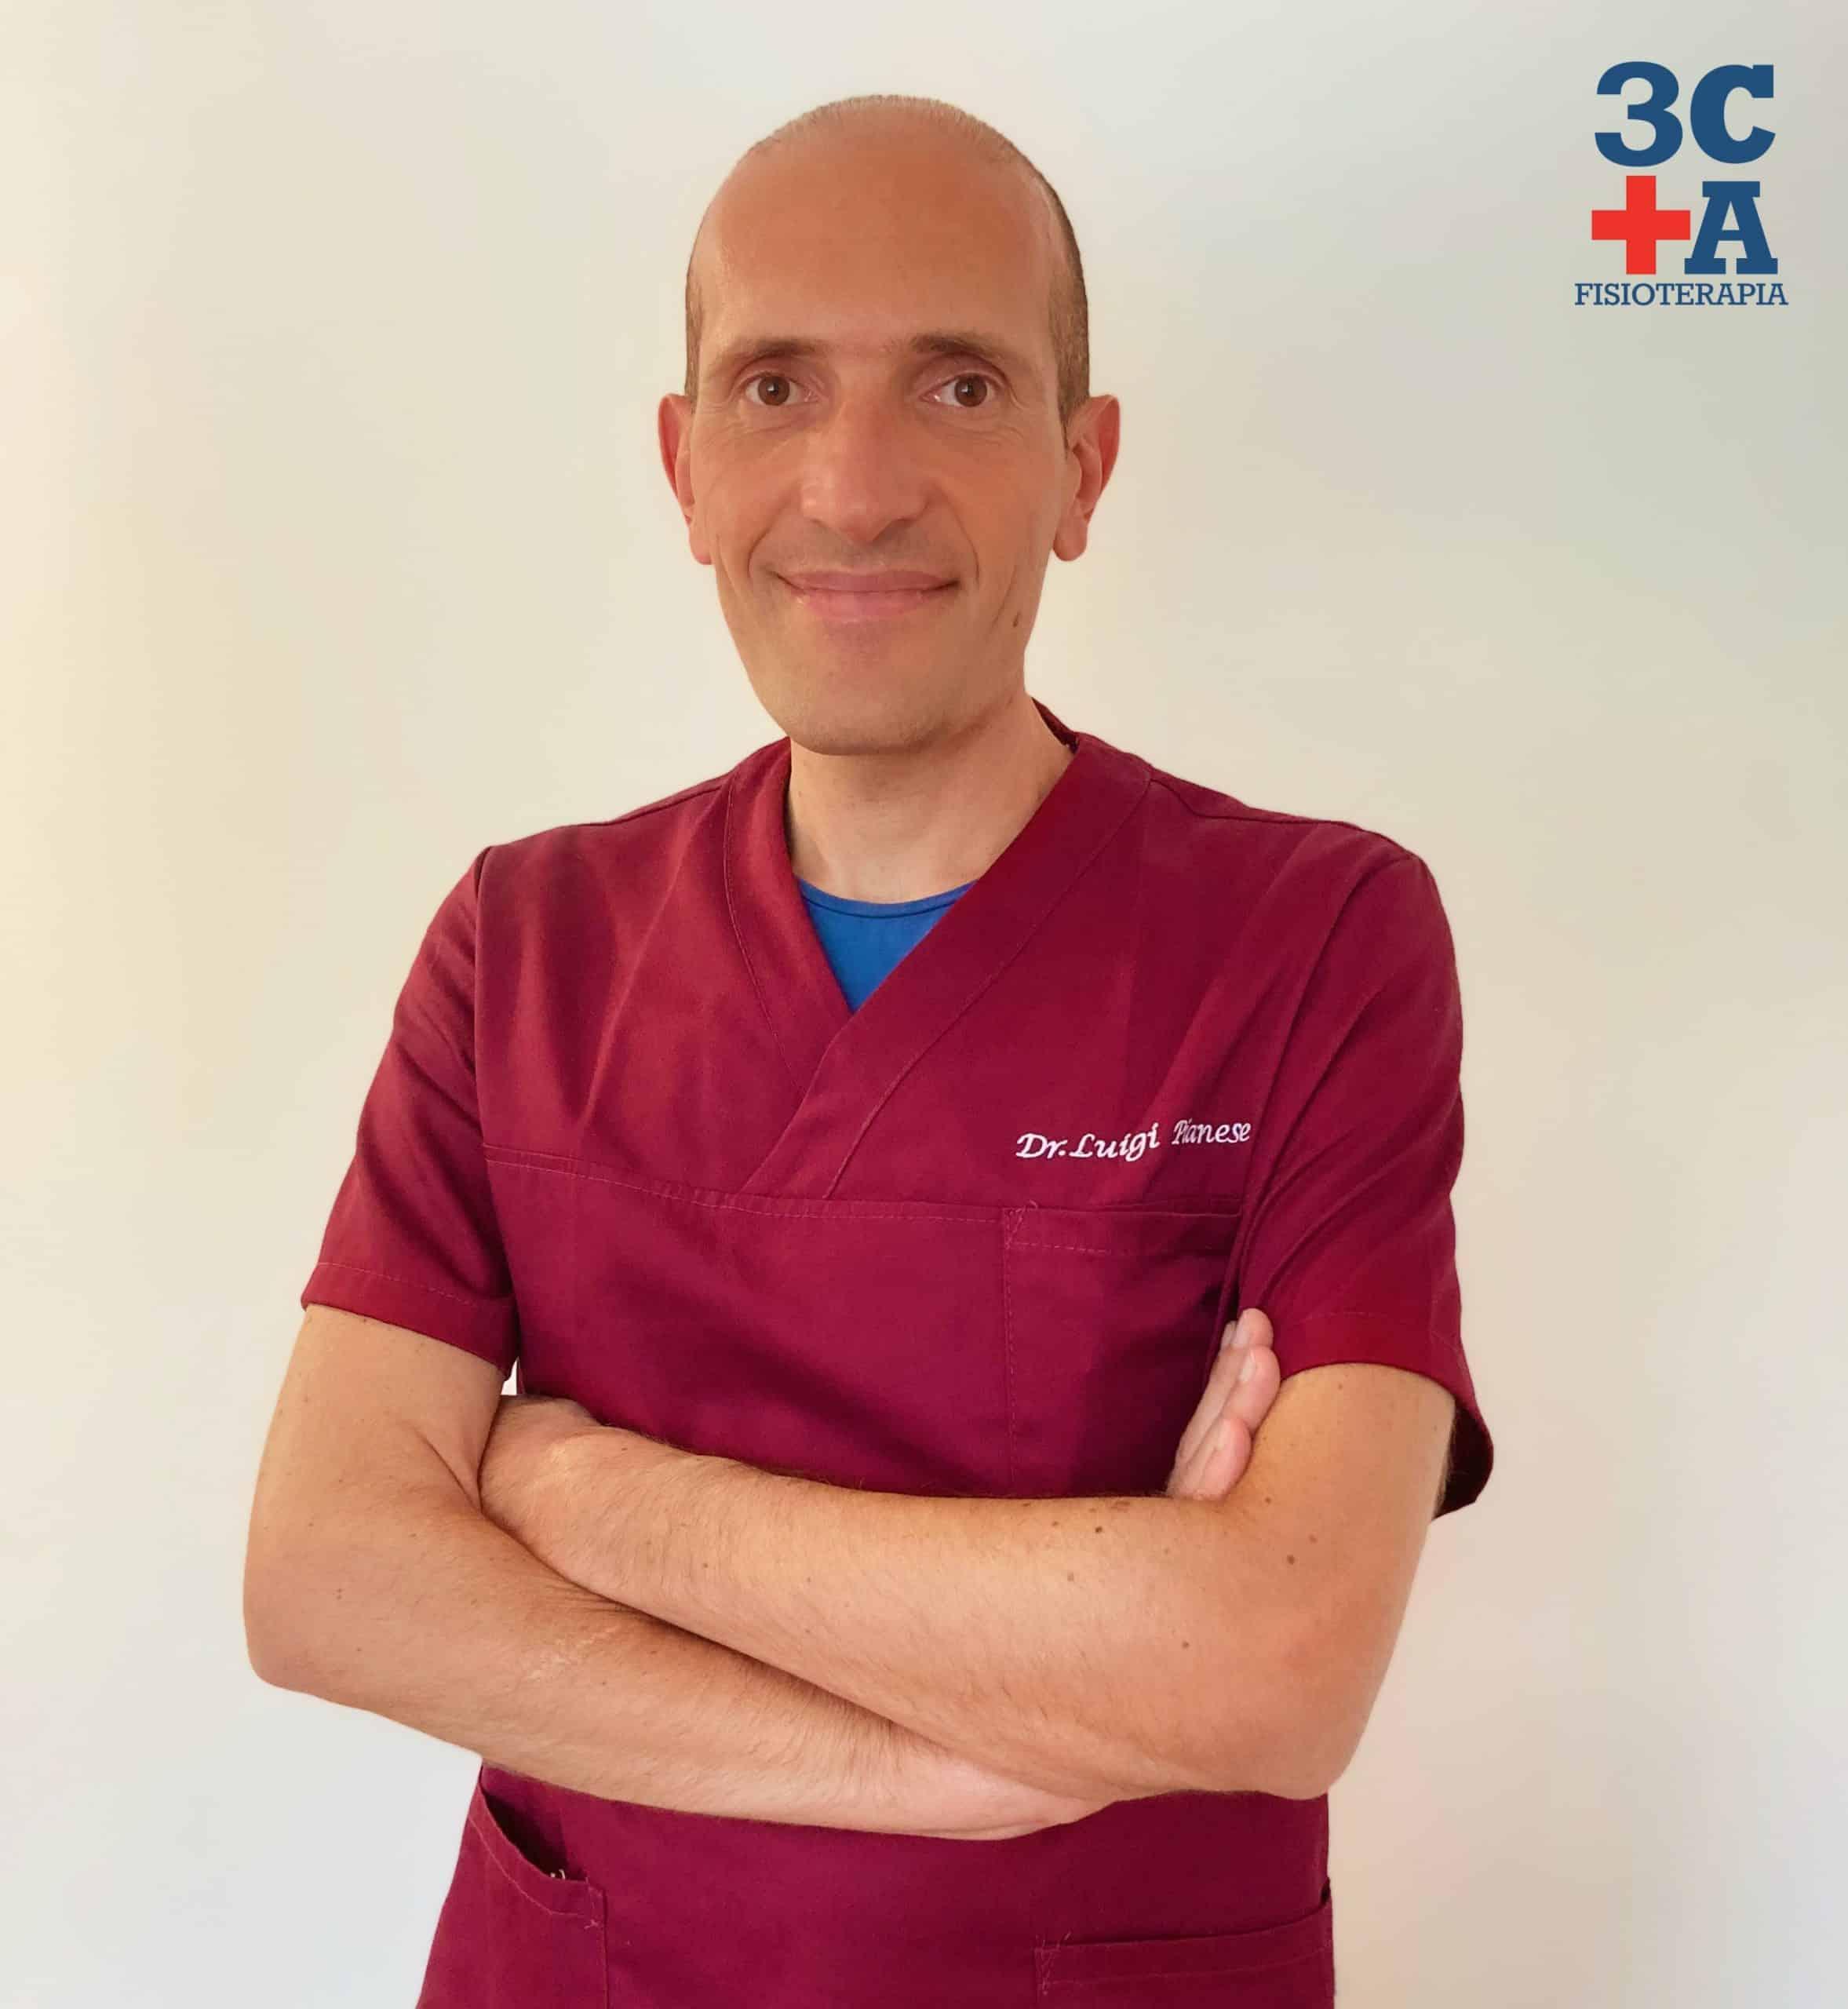 Staff 3C+A Dr Luigi Pianese 011